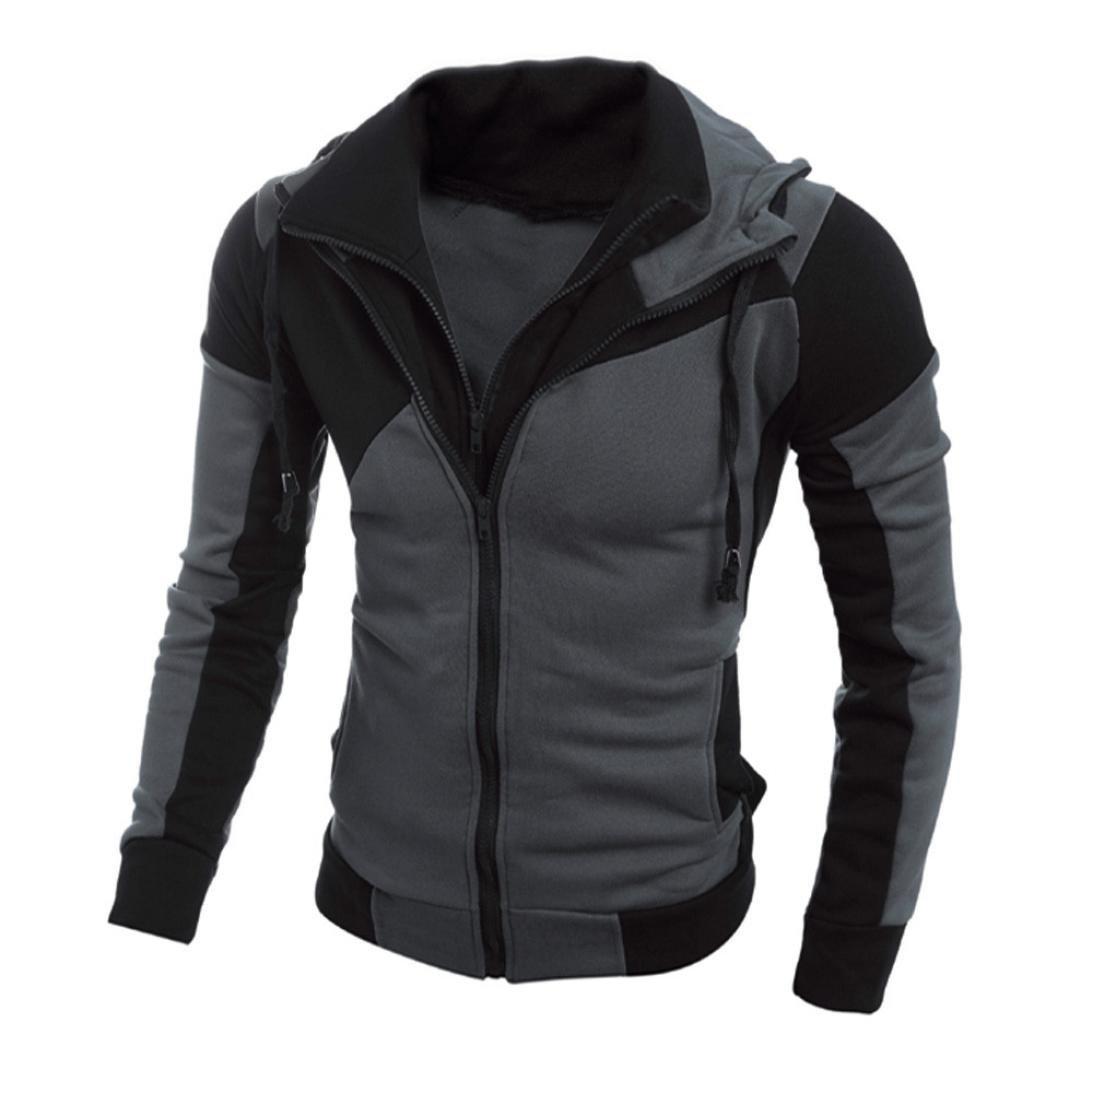 AMSKY❤Mens Fashion Slim Fit Double Zipper Hooded Jacket Hipster Patchwork Sport Cozy Cotton Hoodies Sweatshirts Top Outwear (L, Black)